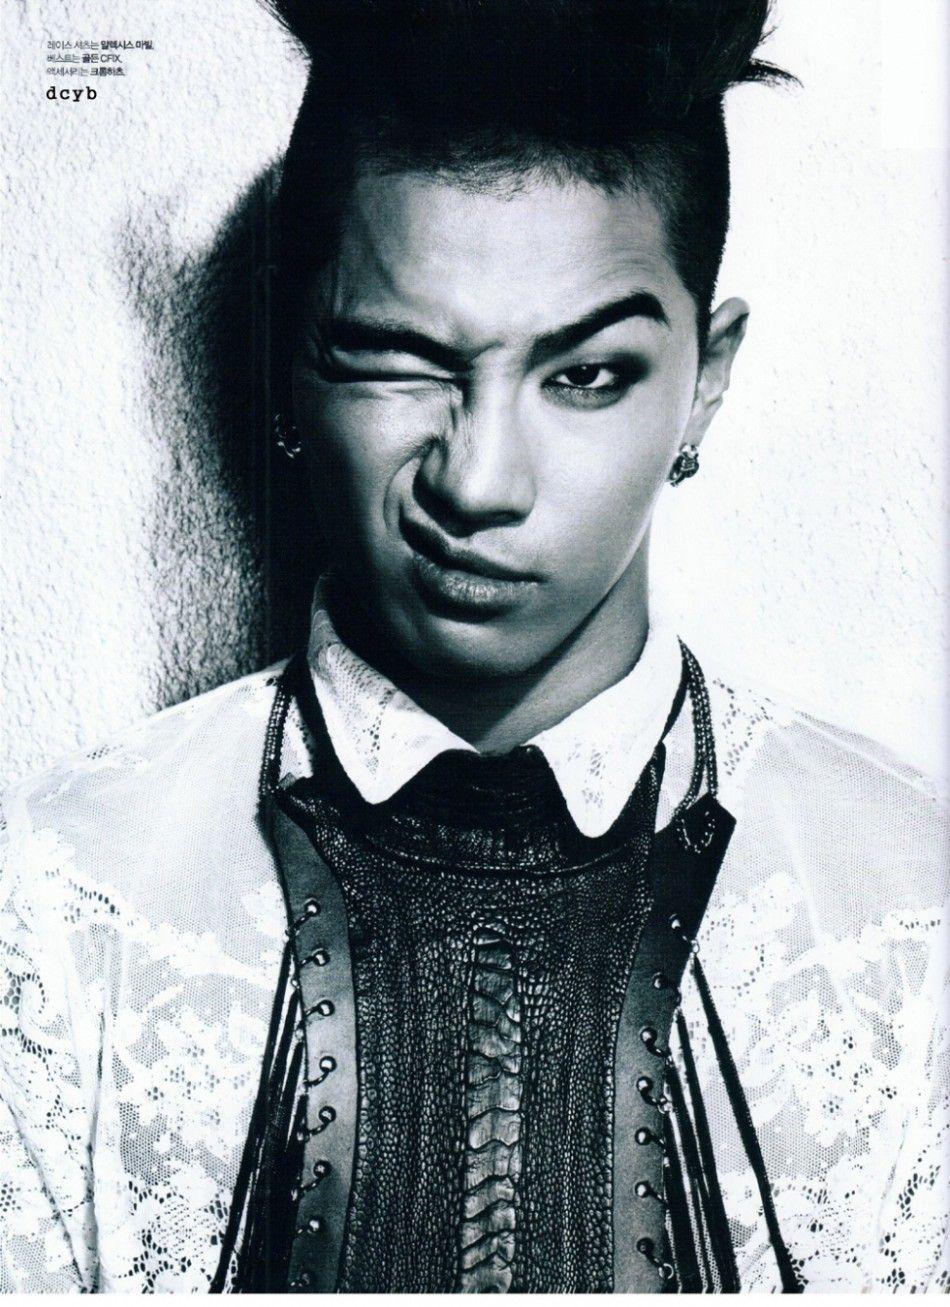 Big Bang's Taeyang Graces Cover of L' Officiel Hommes Magazine [PHOTOS]